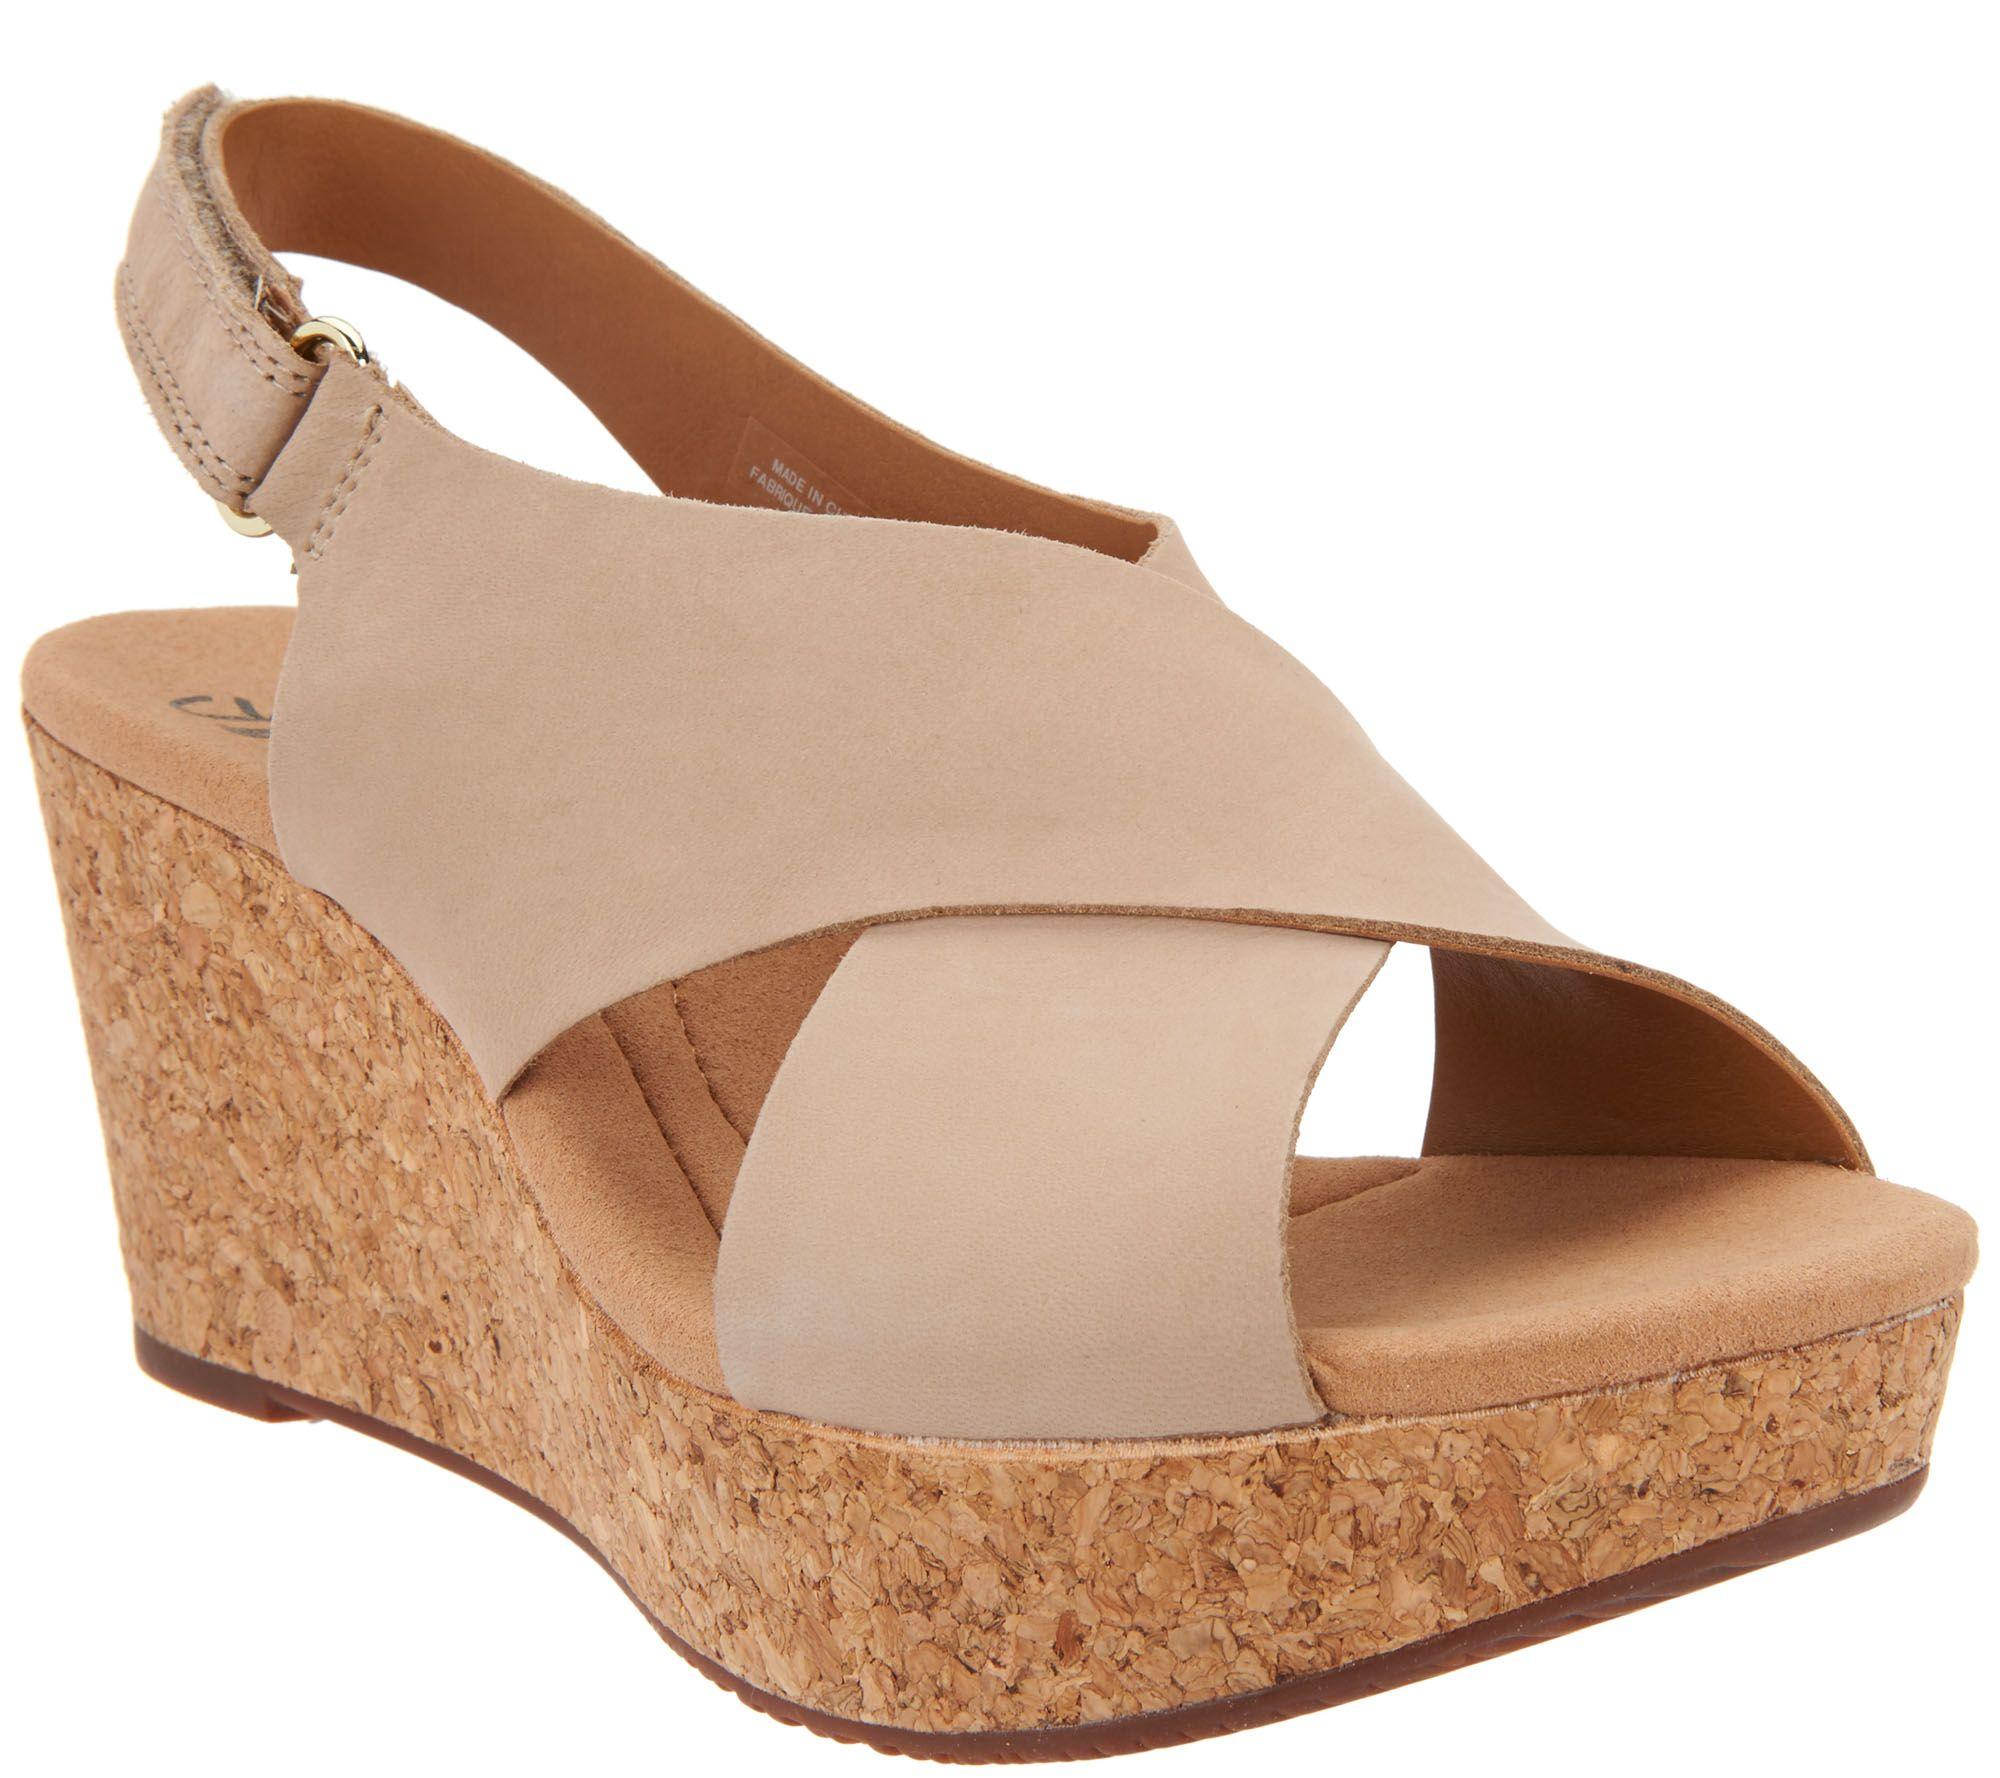 Black sandals belk - Clarks Leather Cork Wedge Sandals Annadel Eirwyn A299094